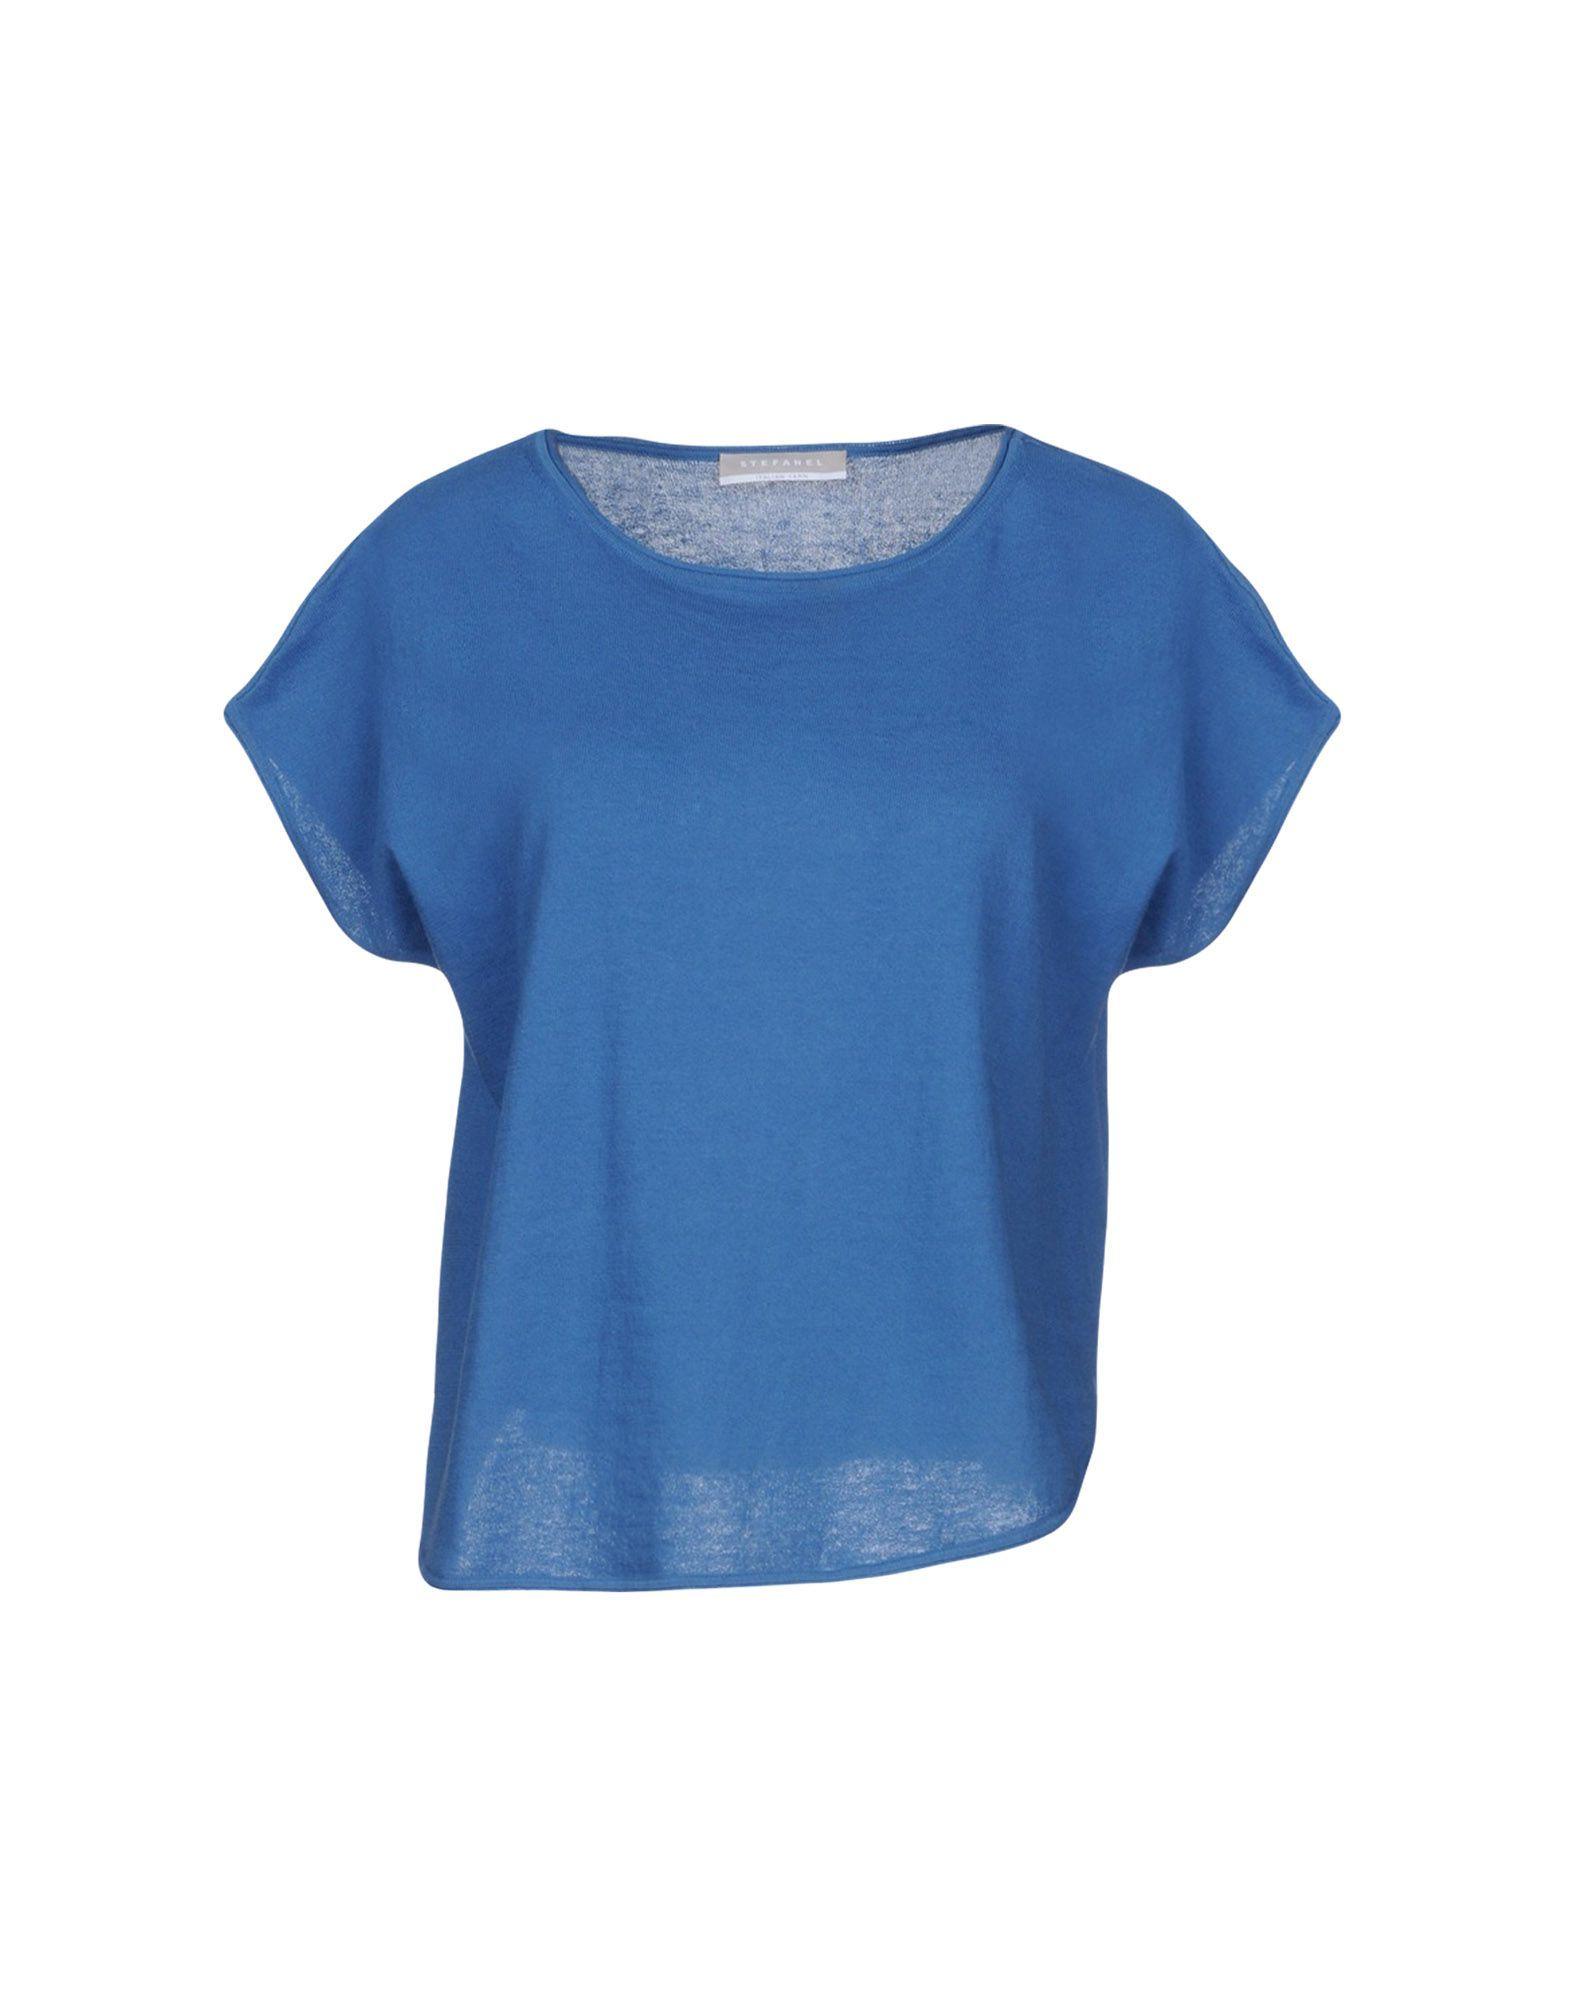 Stefanel Blue Cotton Short Sleeve Knit